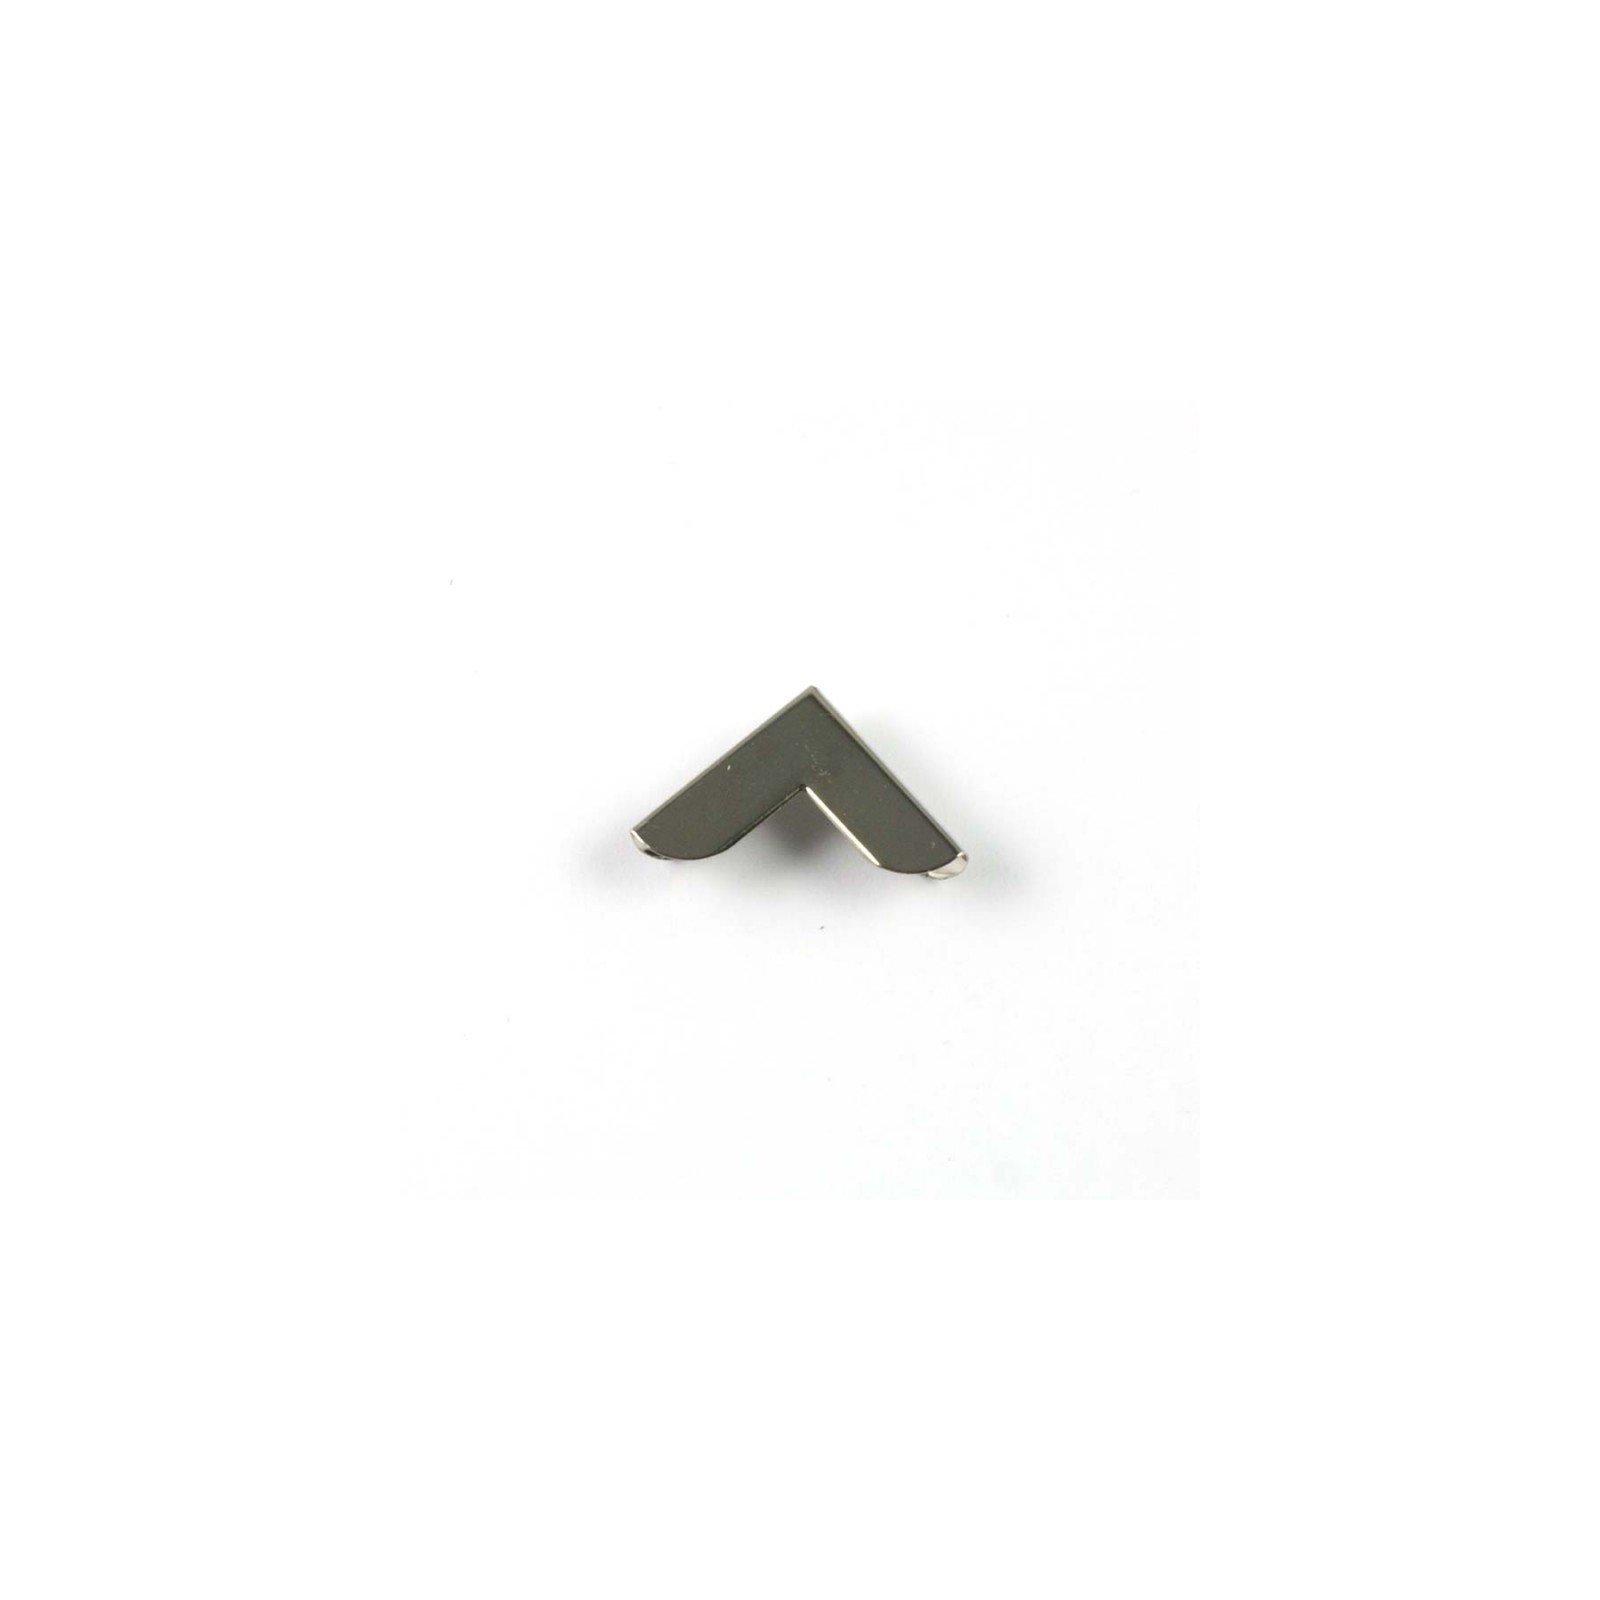 Coin en métal argenté 20x20 mm - Ephemeria